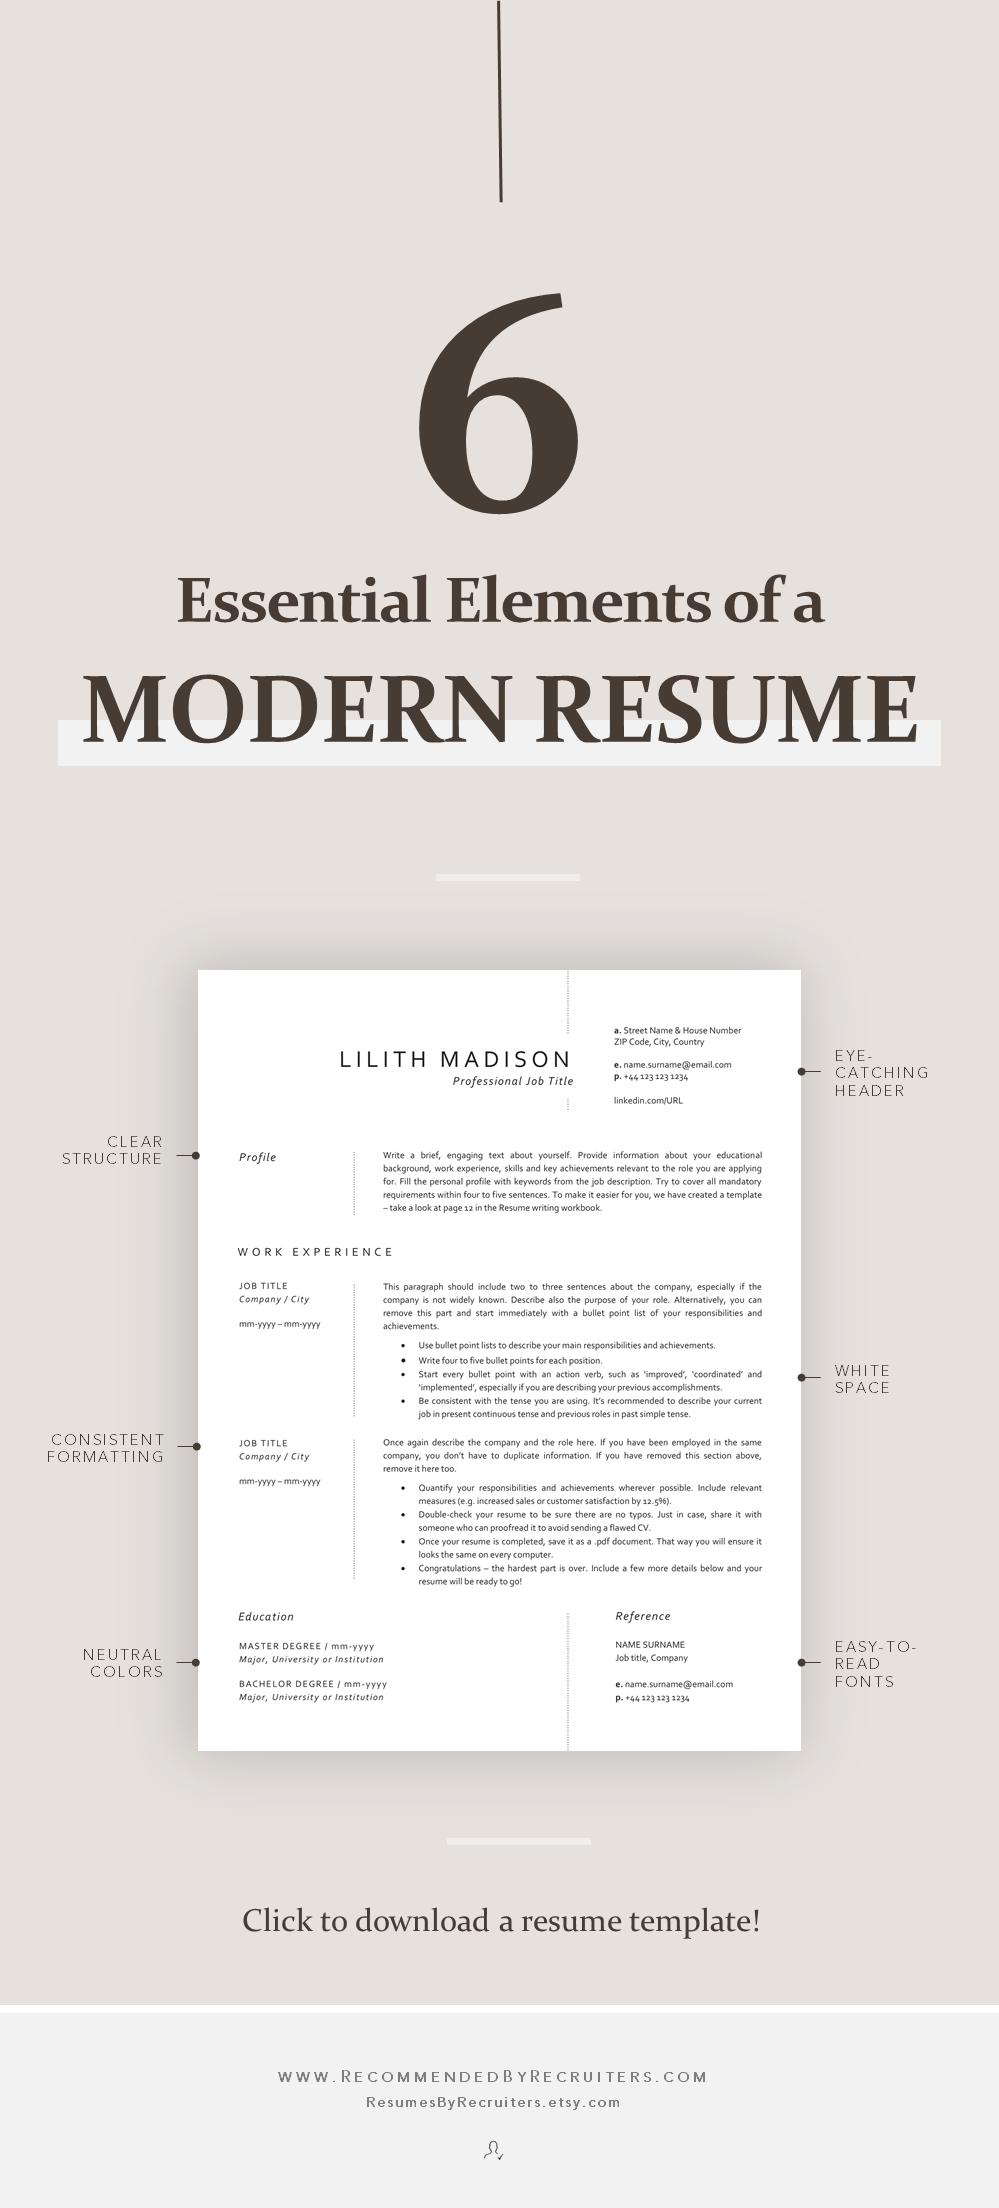 Resume Template Nurse Instant Download Classic Cv For Etsy In 2020 Resume Template Medical Resume Template Resume Design